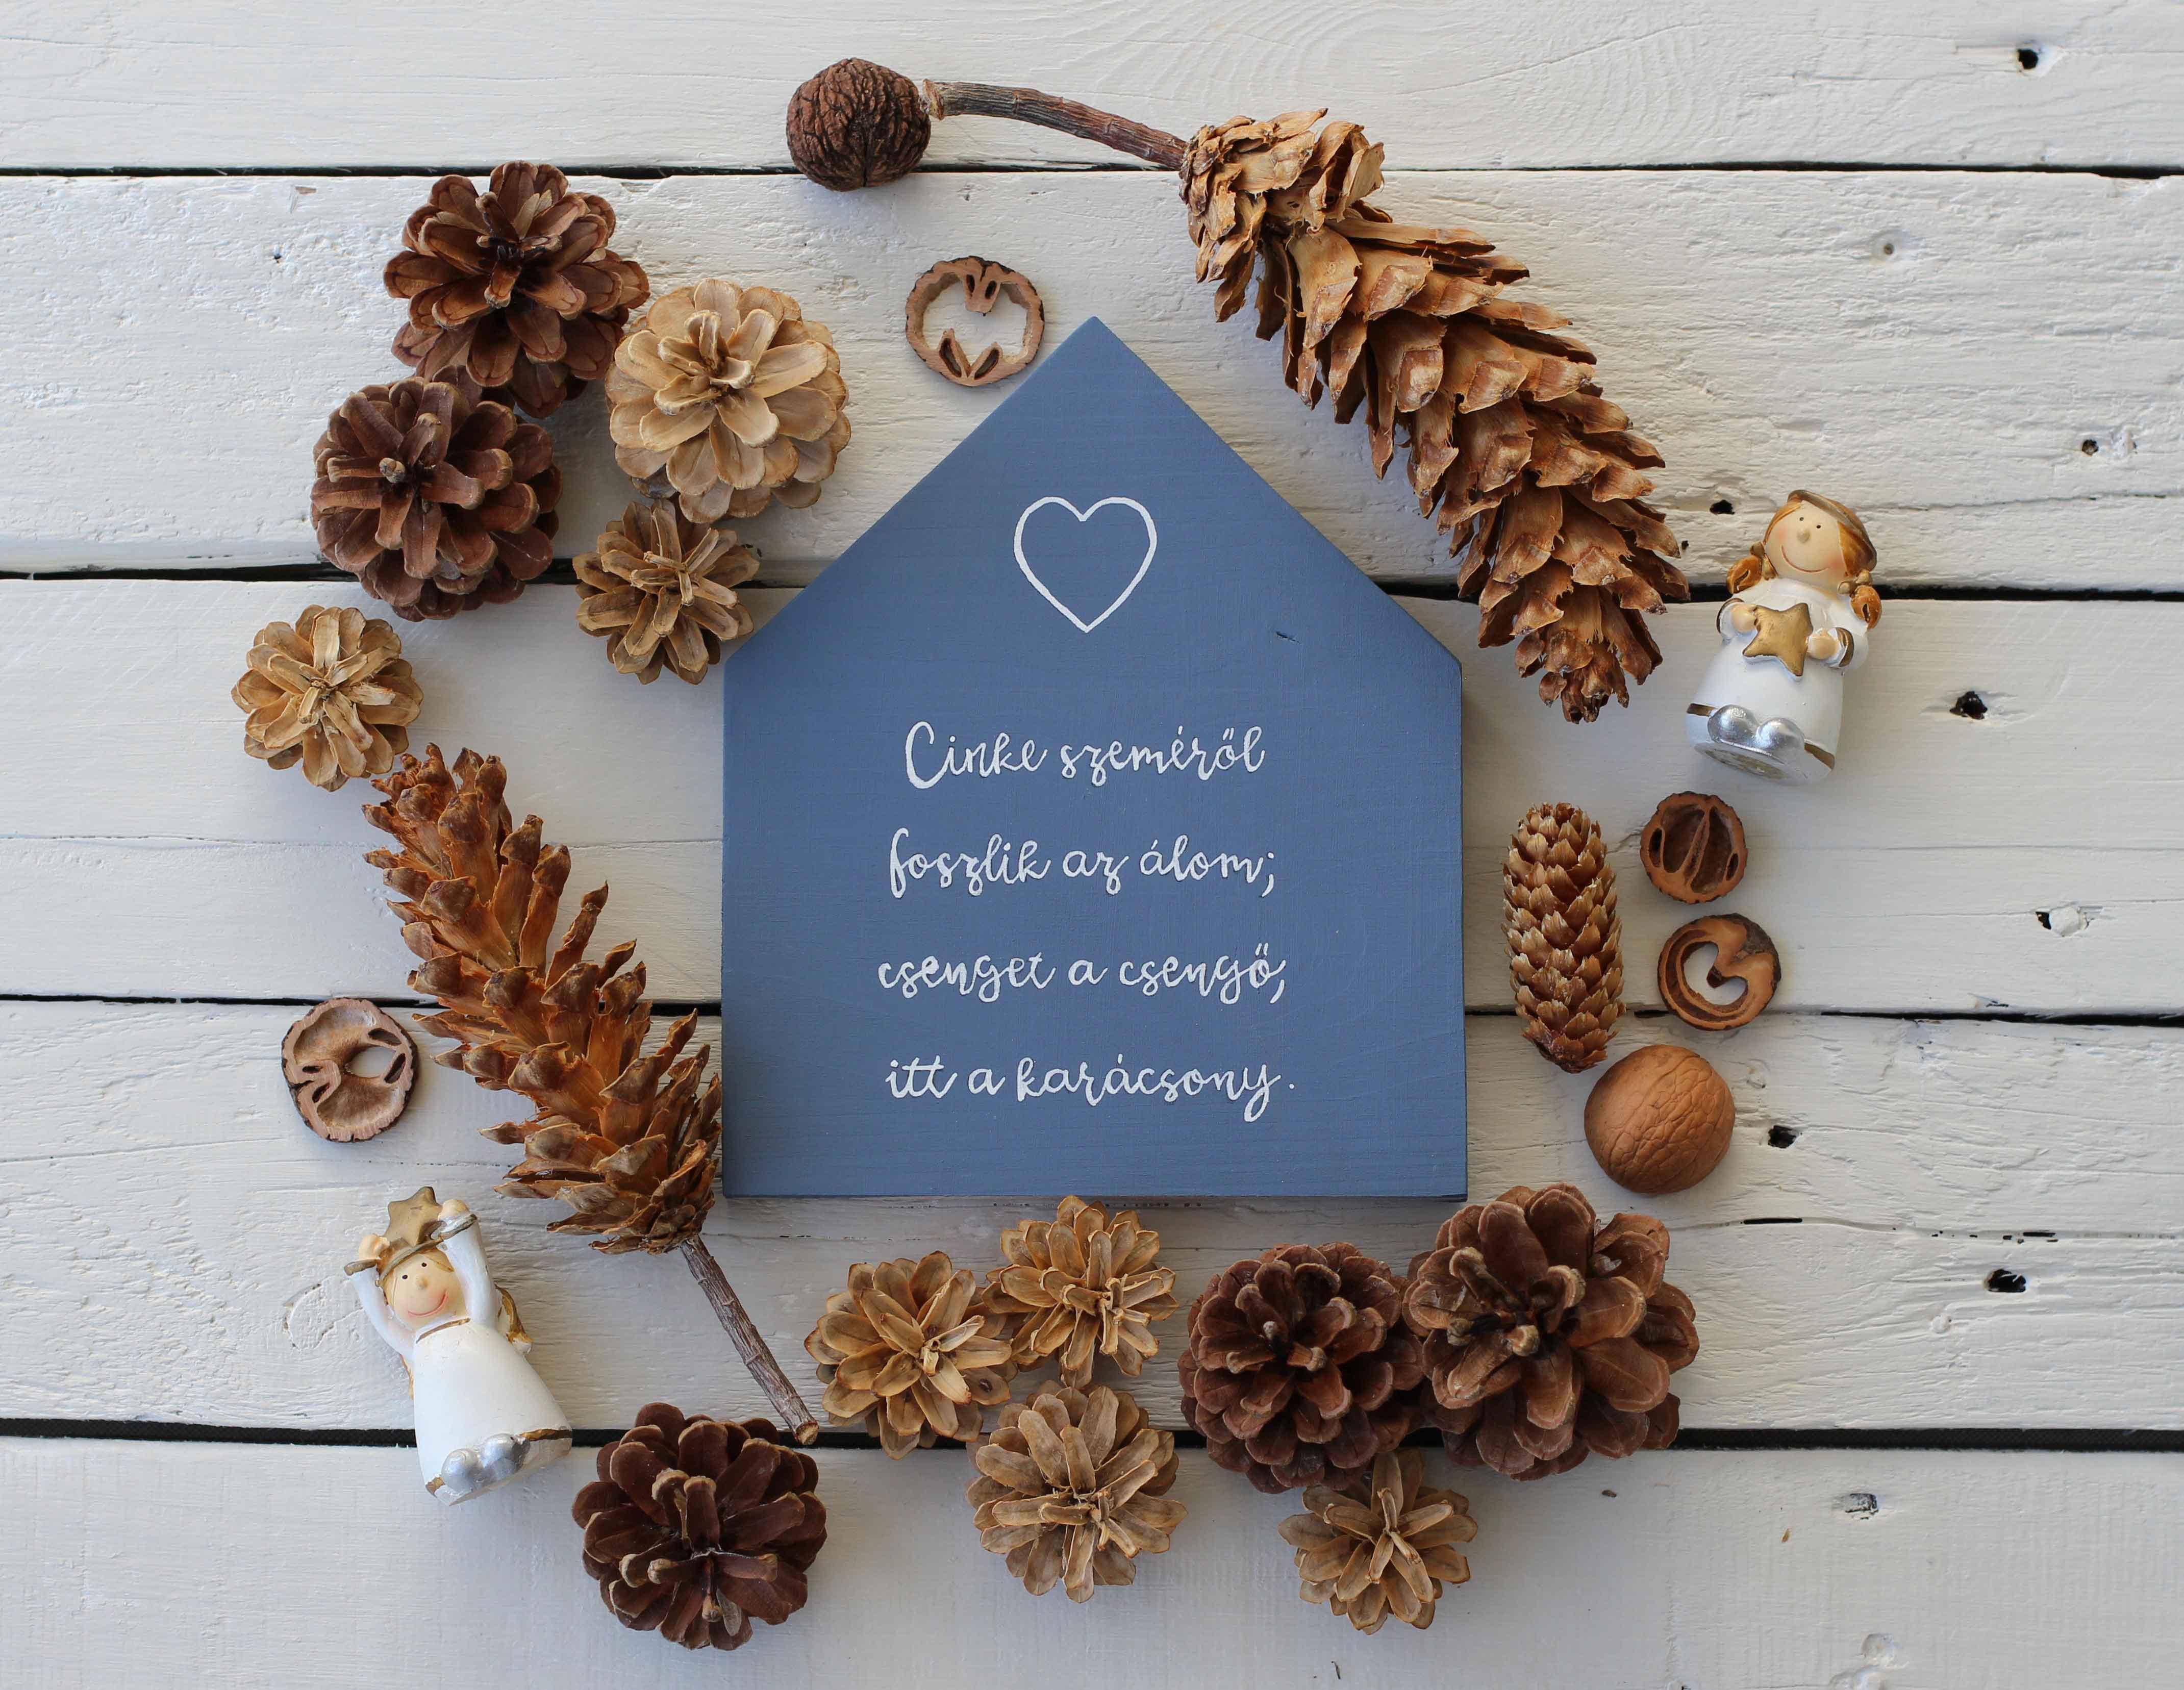 DIY karácsonyi dekor: faházikók skandináv stílusban